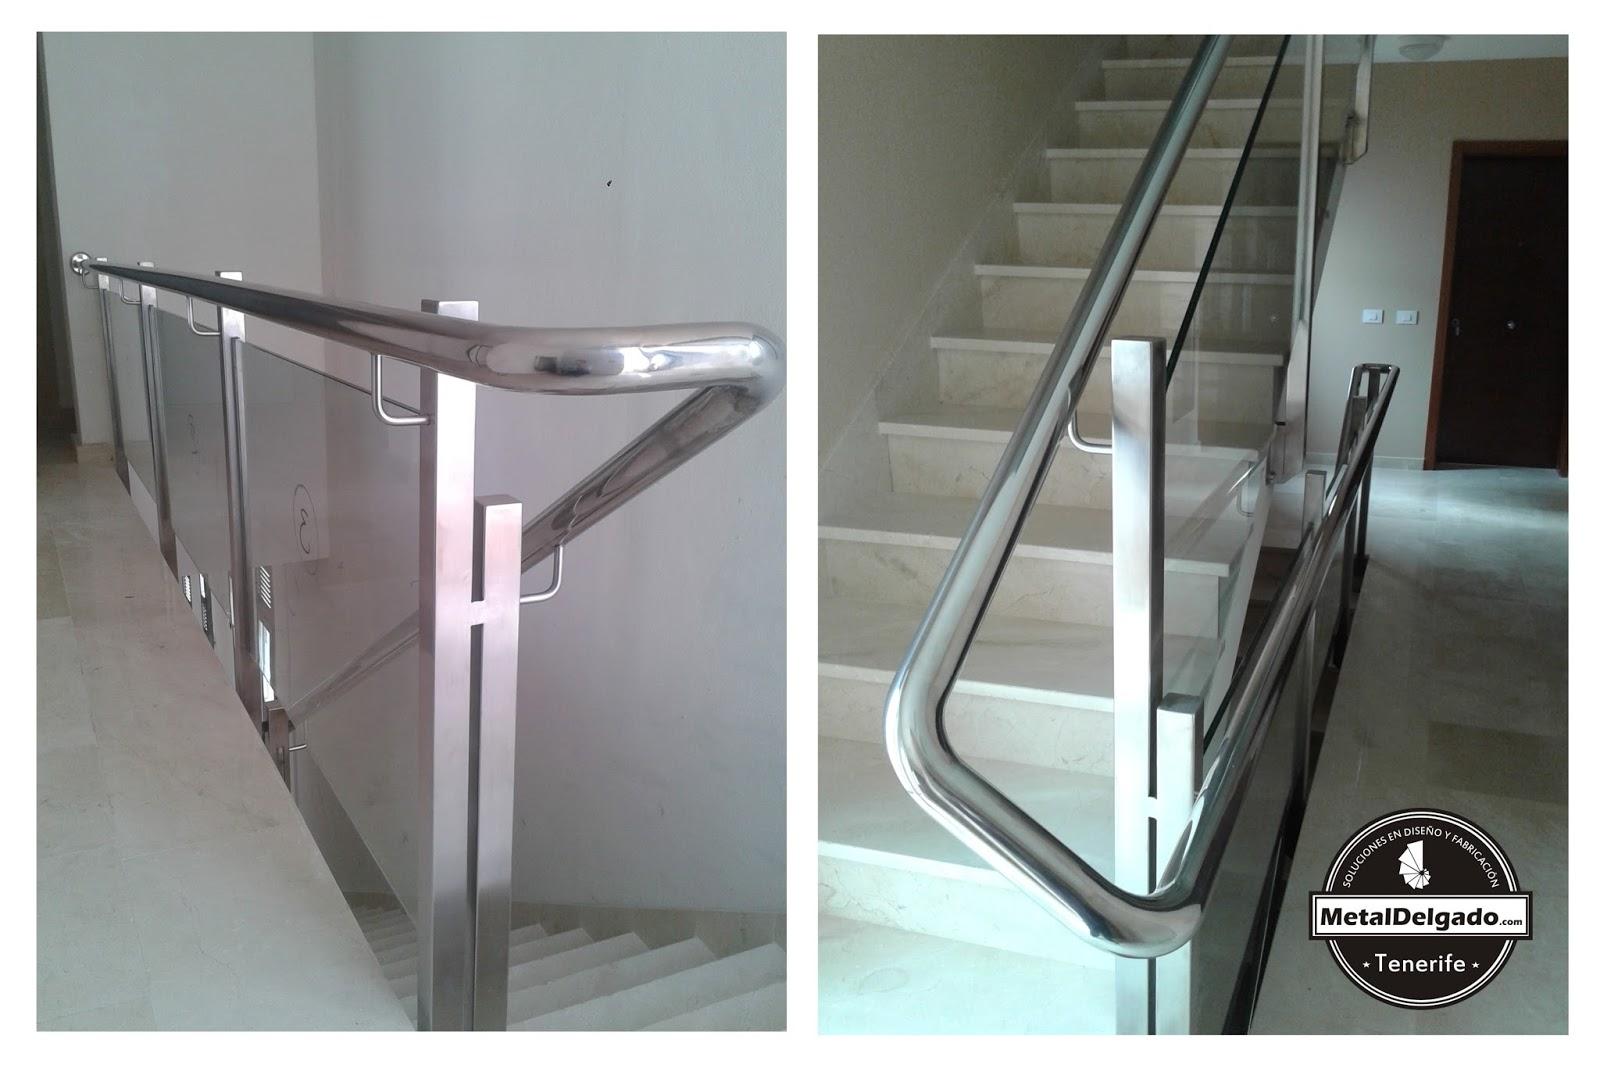 Acero inoxidable tenerife barandas acero inoxidable para escalera - Barandilla de acero inoxidable ...